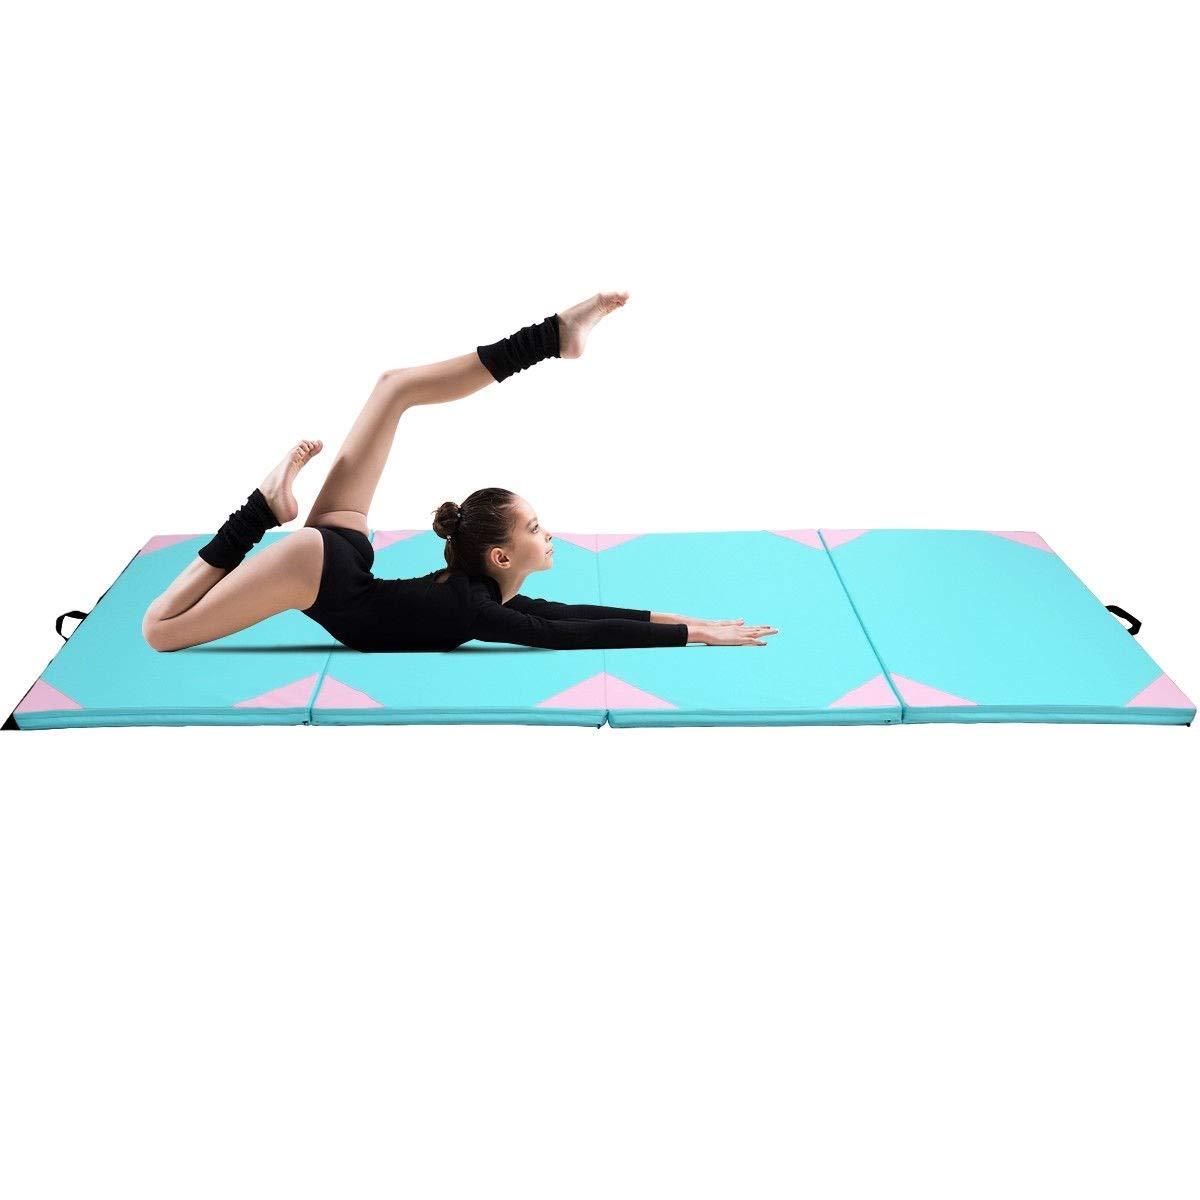 Apontus 4 ' x10 ' x2厚ジムフィットネス練習体操マットブルー B07D7KBSK6